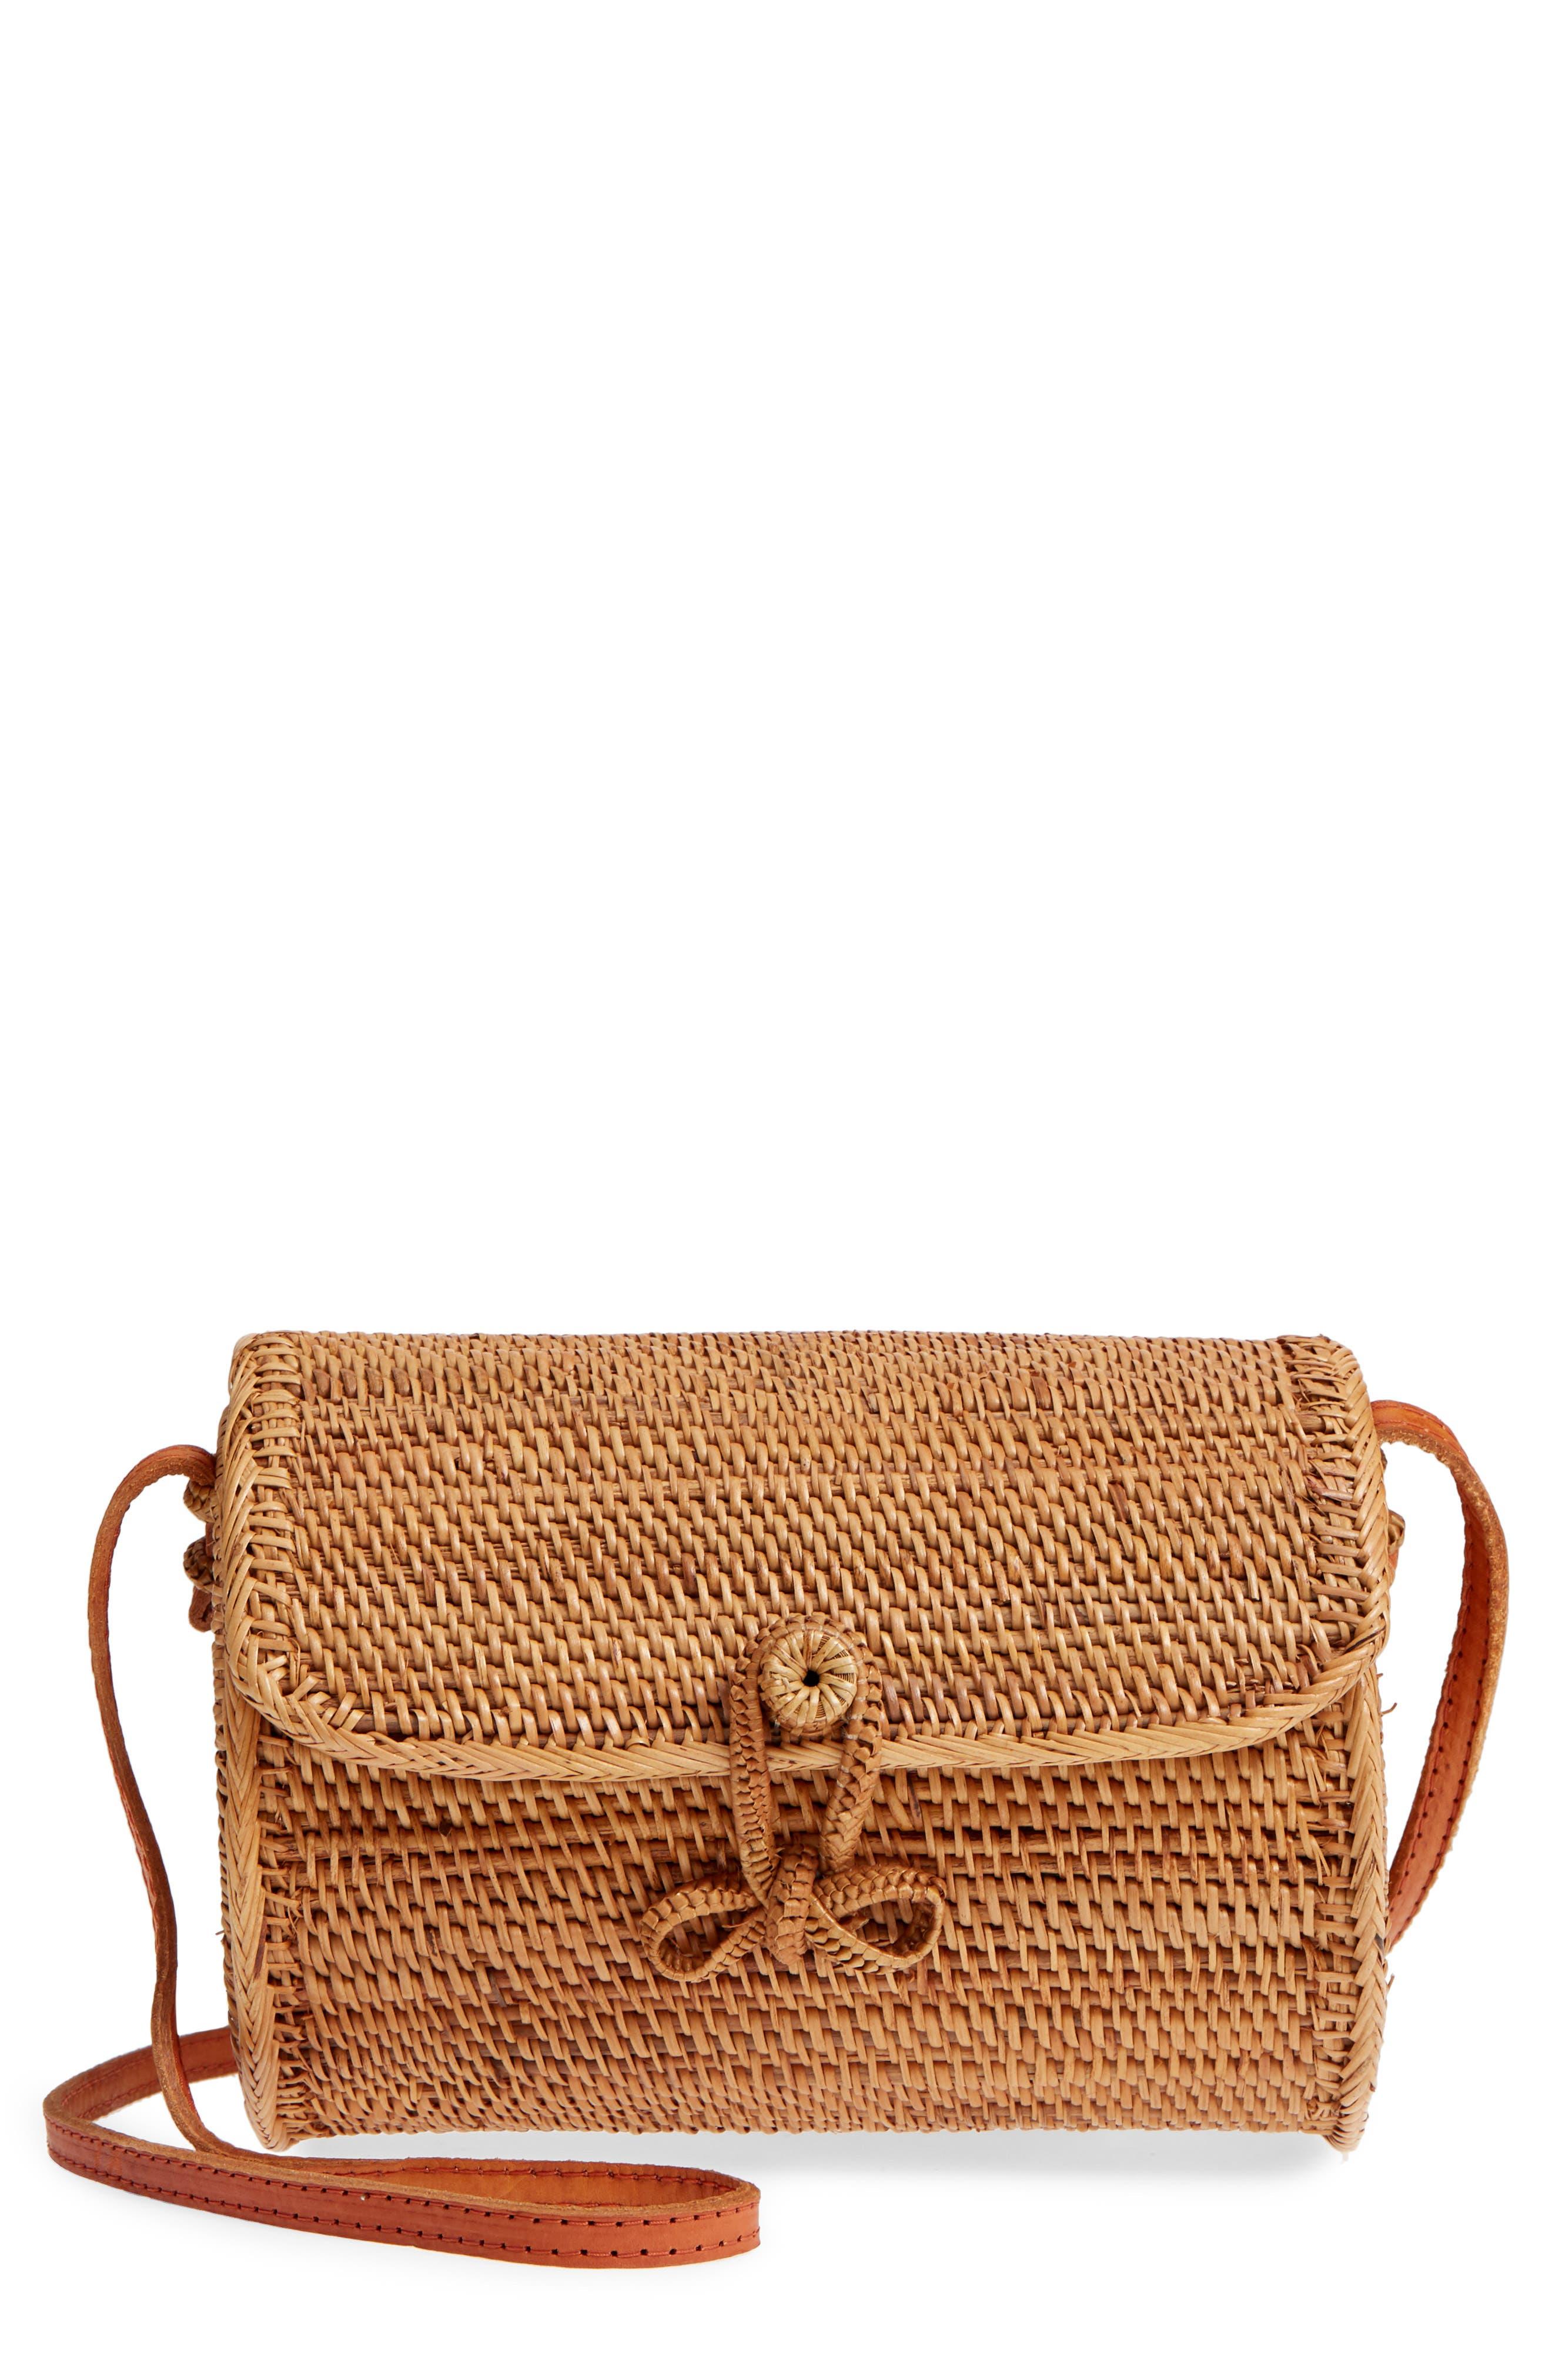 Cylinder Woven Crossbody Bag,                             Main thumbnail 1, color,                             Tan